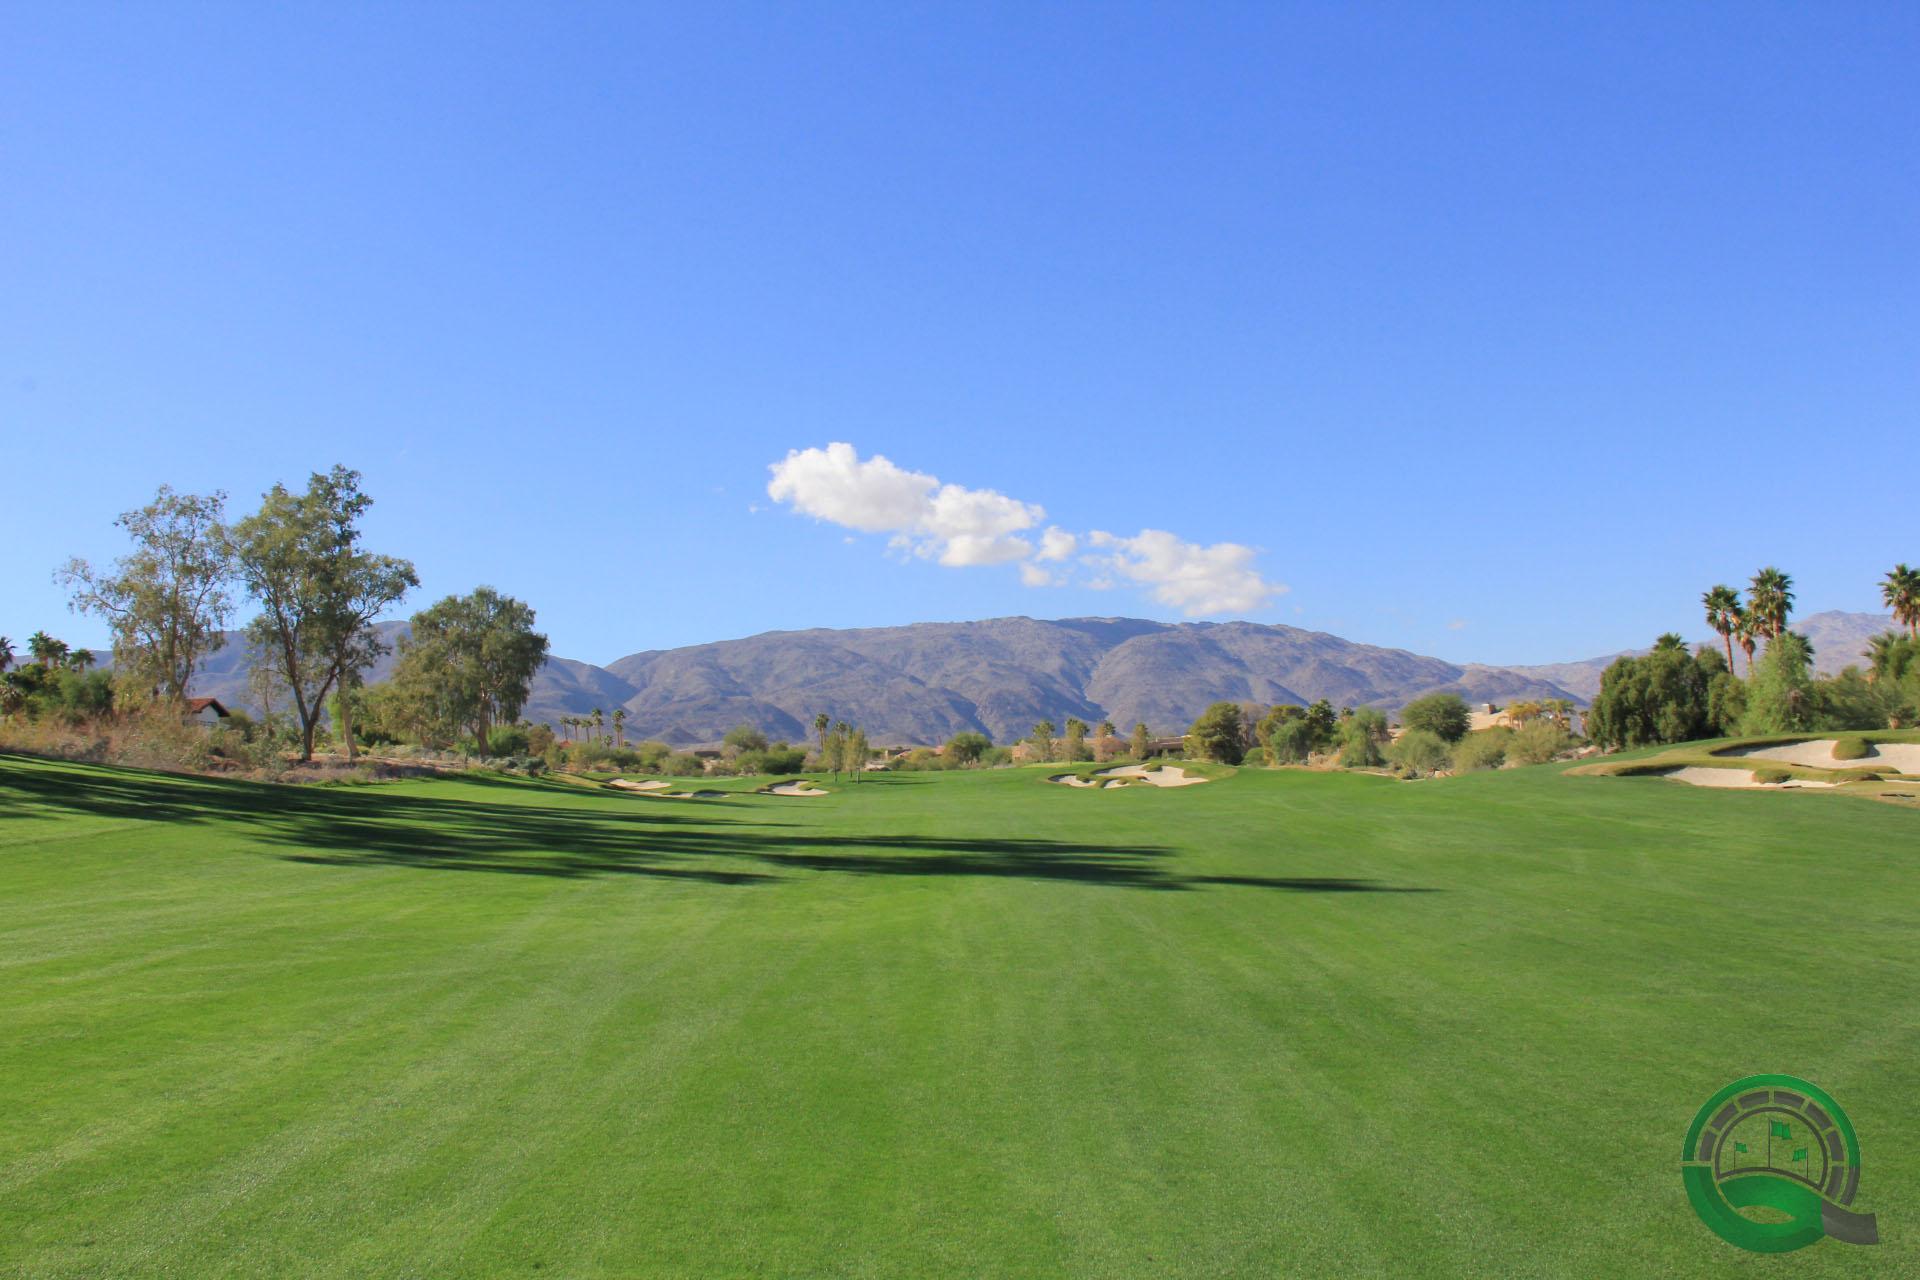 Rams Hill Golf Club Hole 2 Fairway